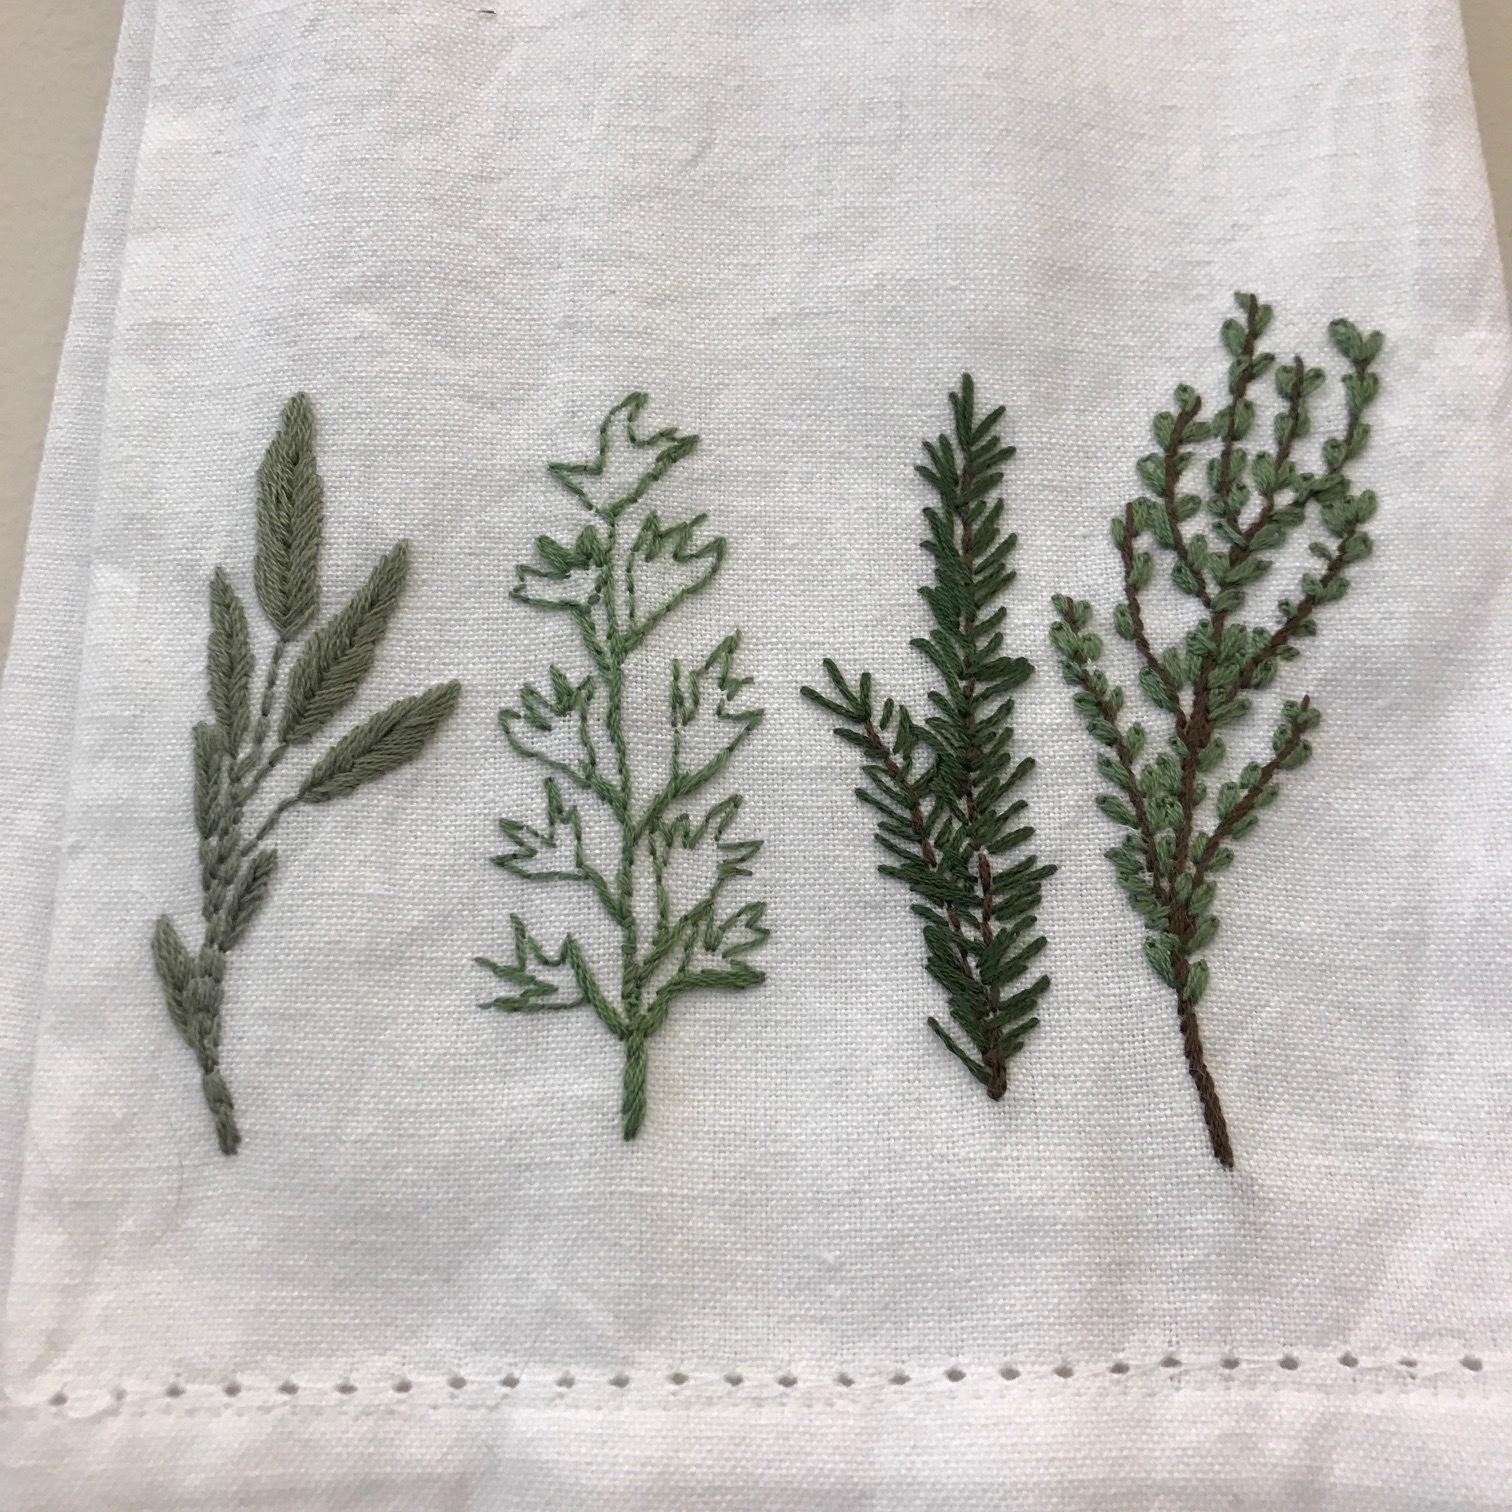 HErb Embroidery.JPG